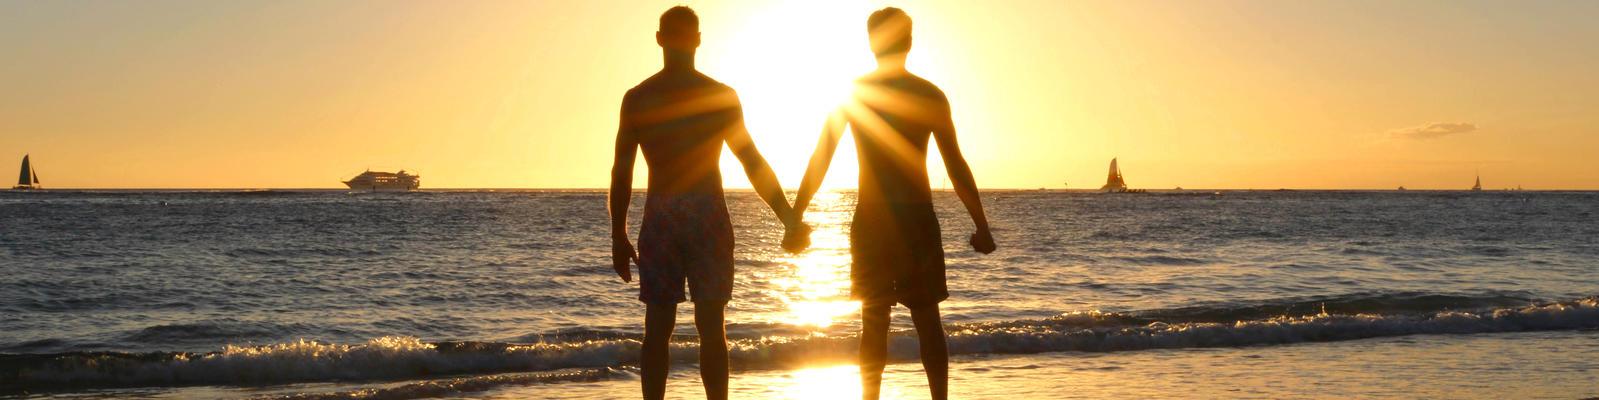 Couple Watching Sunset (Photo: Sebastianrg/Shutterstock)